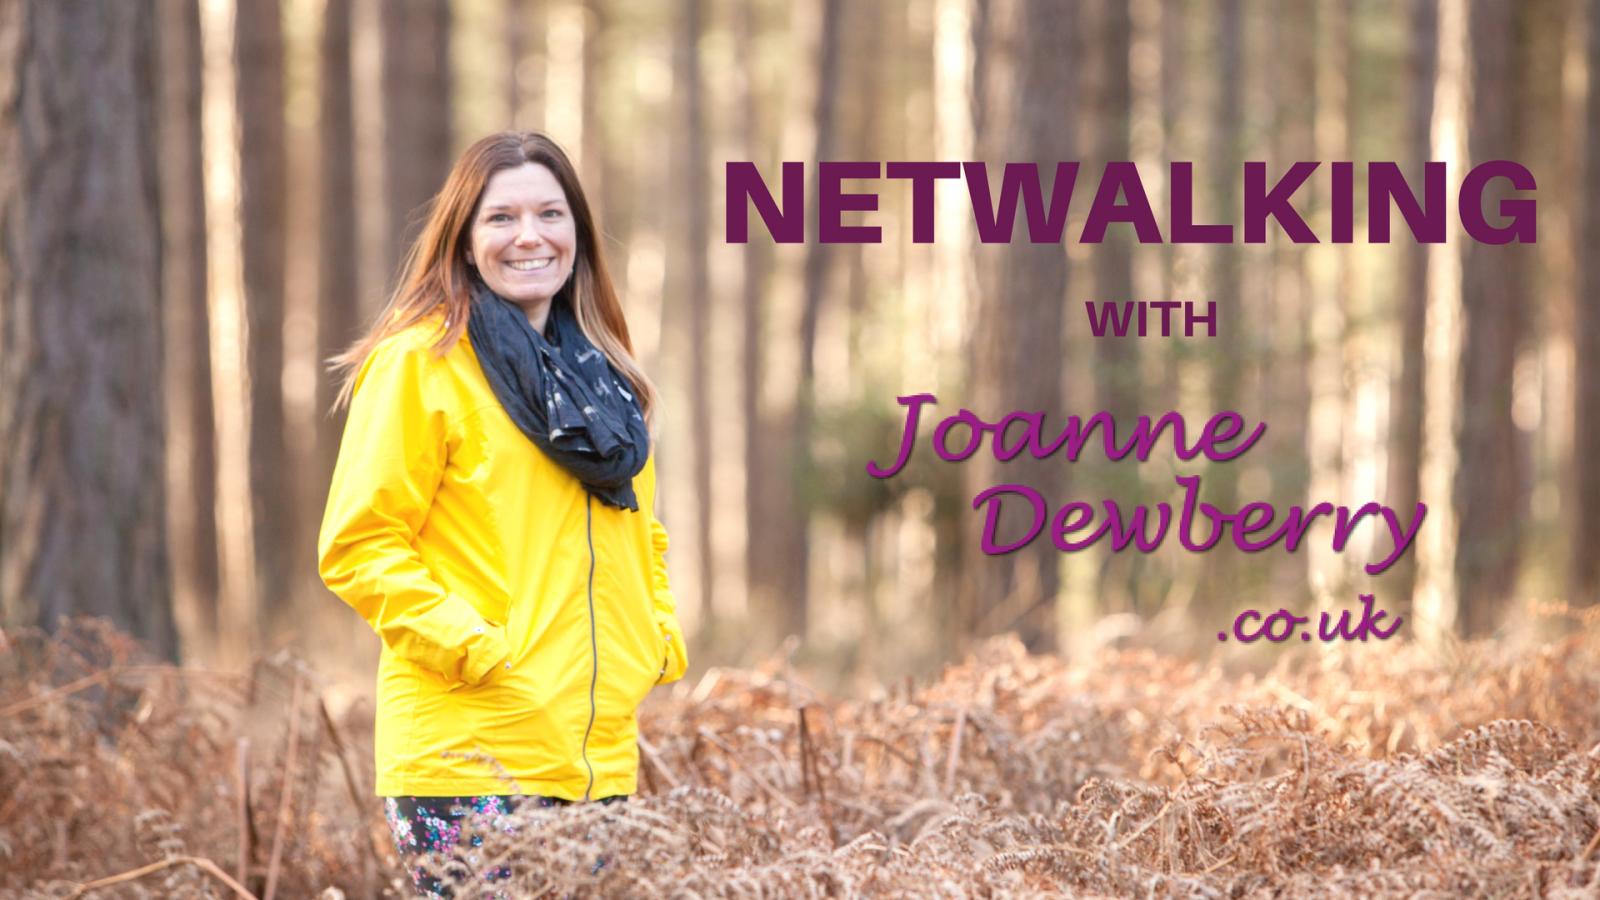 netwalking business networking Dorset